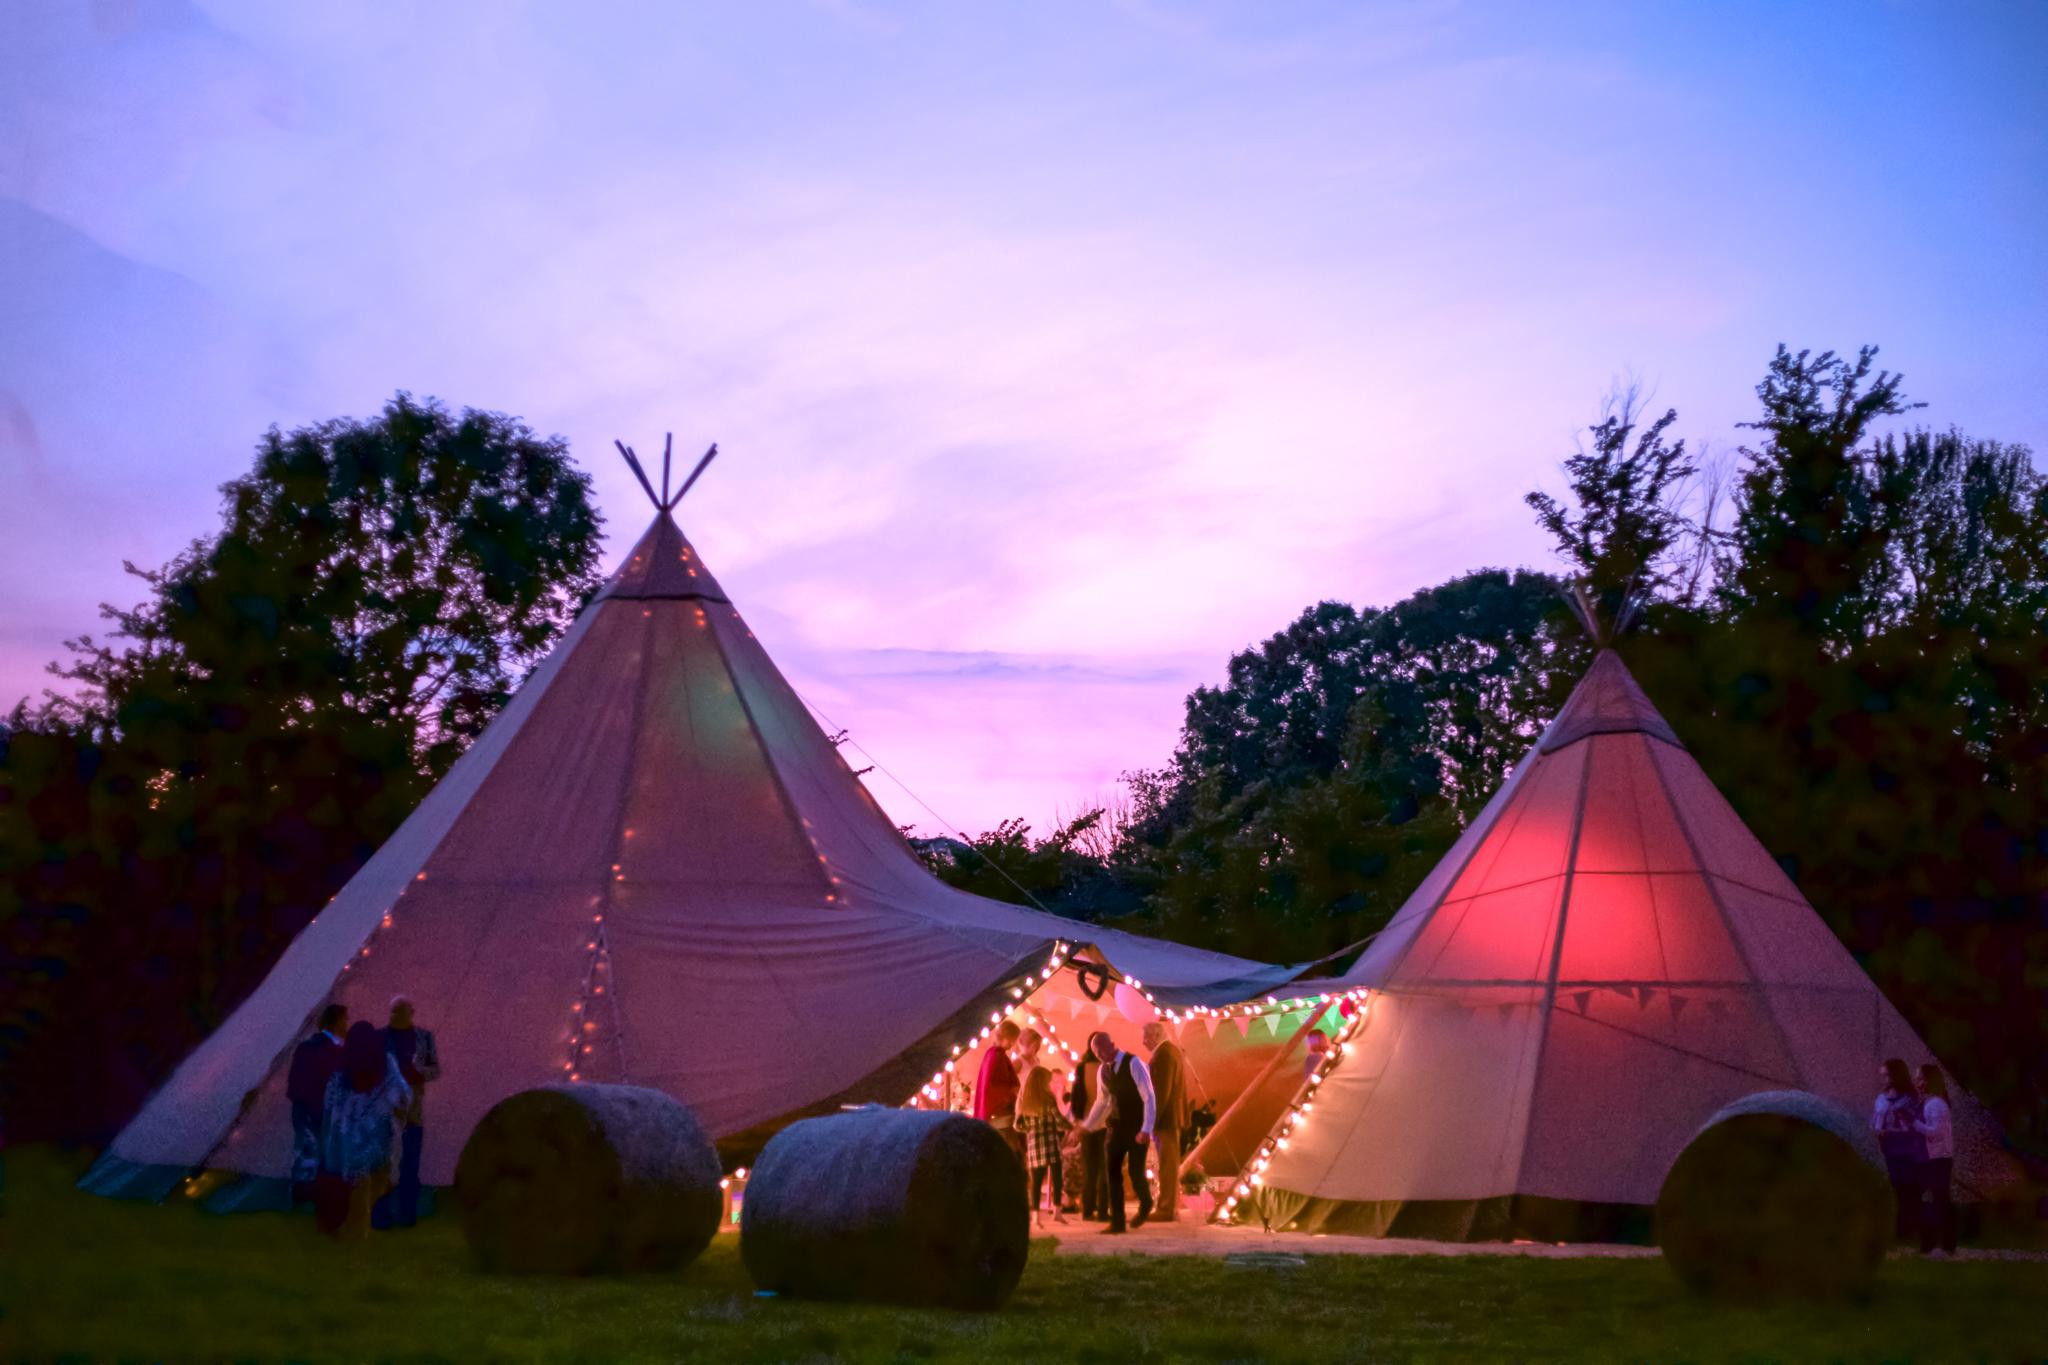 kingscote-barn-wedding-photographer-cardiff-1-2